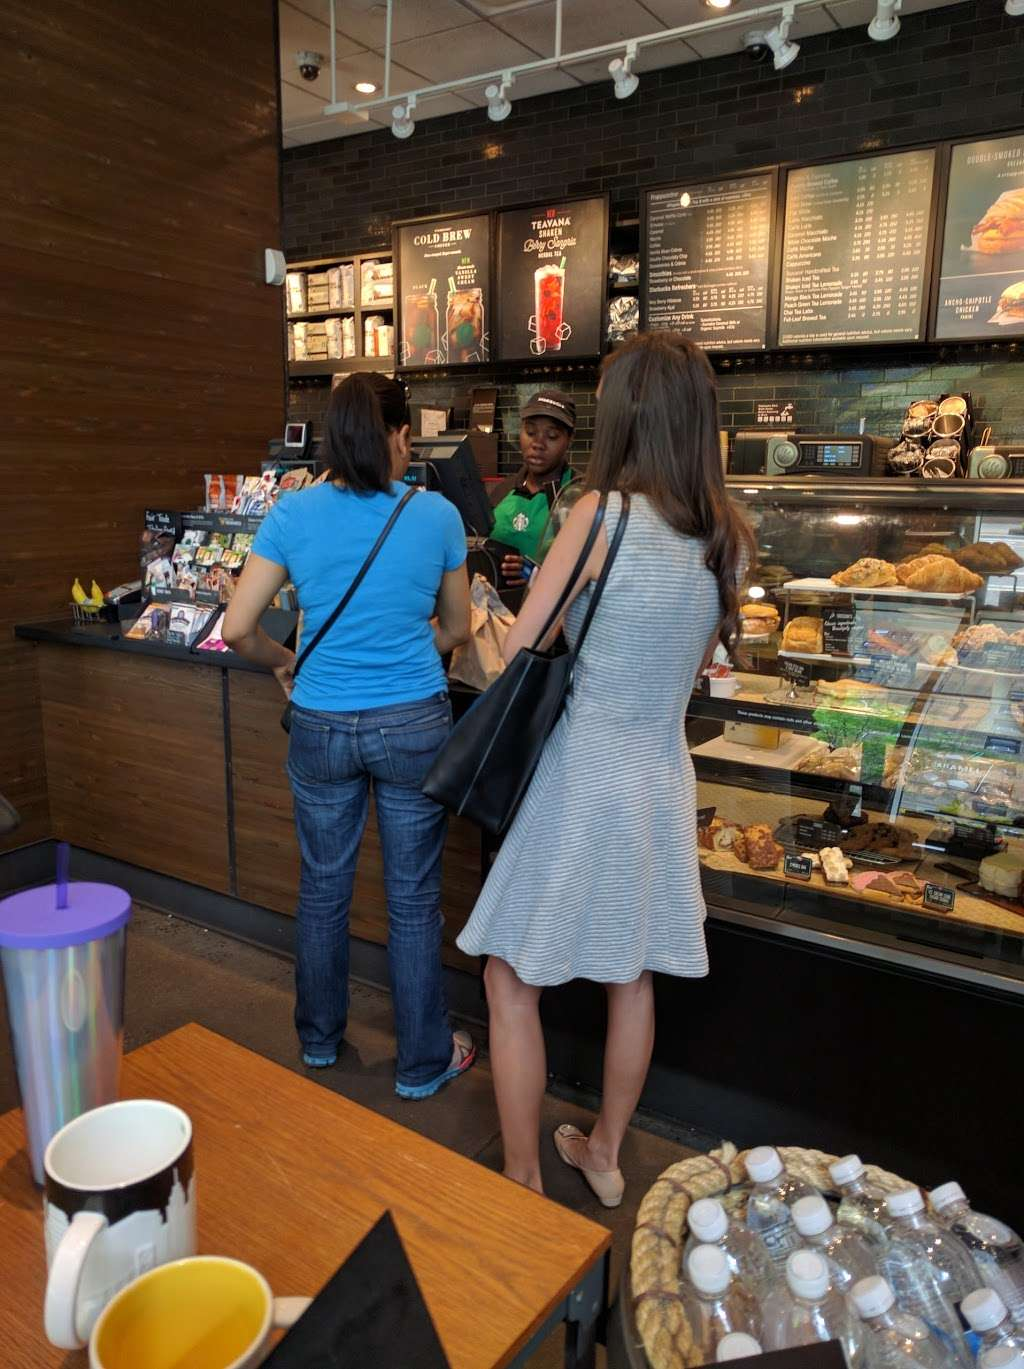 Starbucks - cafe  | Photo 9 of 10 | Address: 350 W 42nd St, New York, NY 10036, USA | Phone: (212) 244-4176